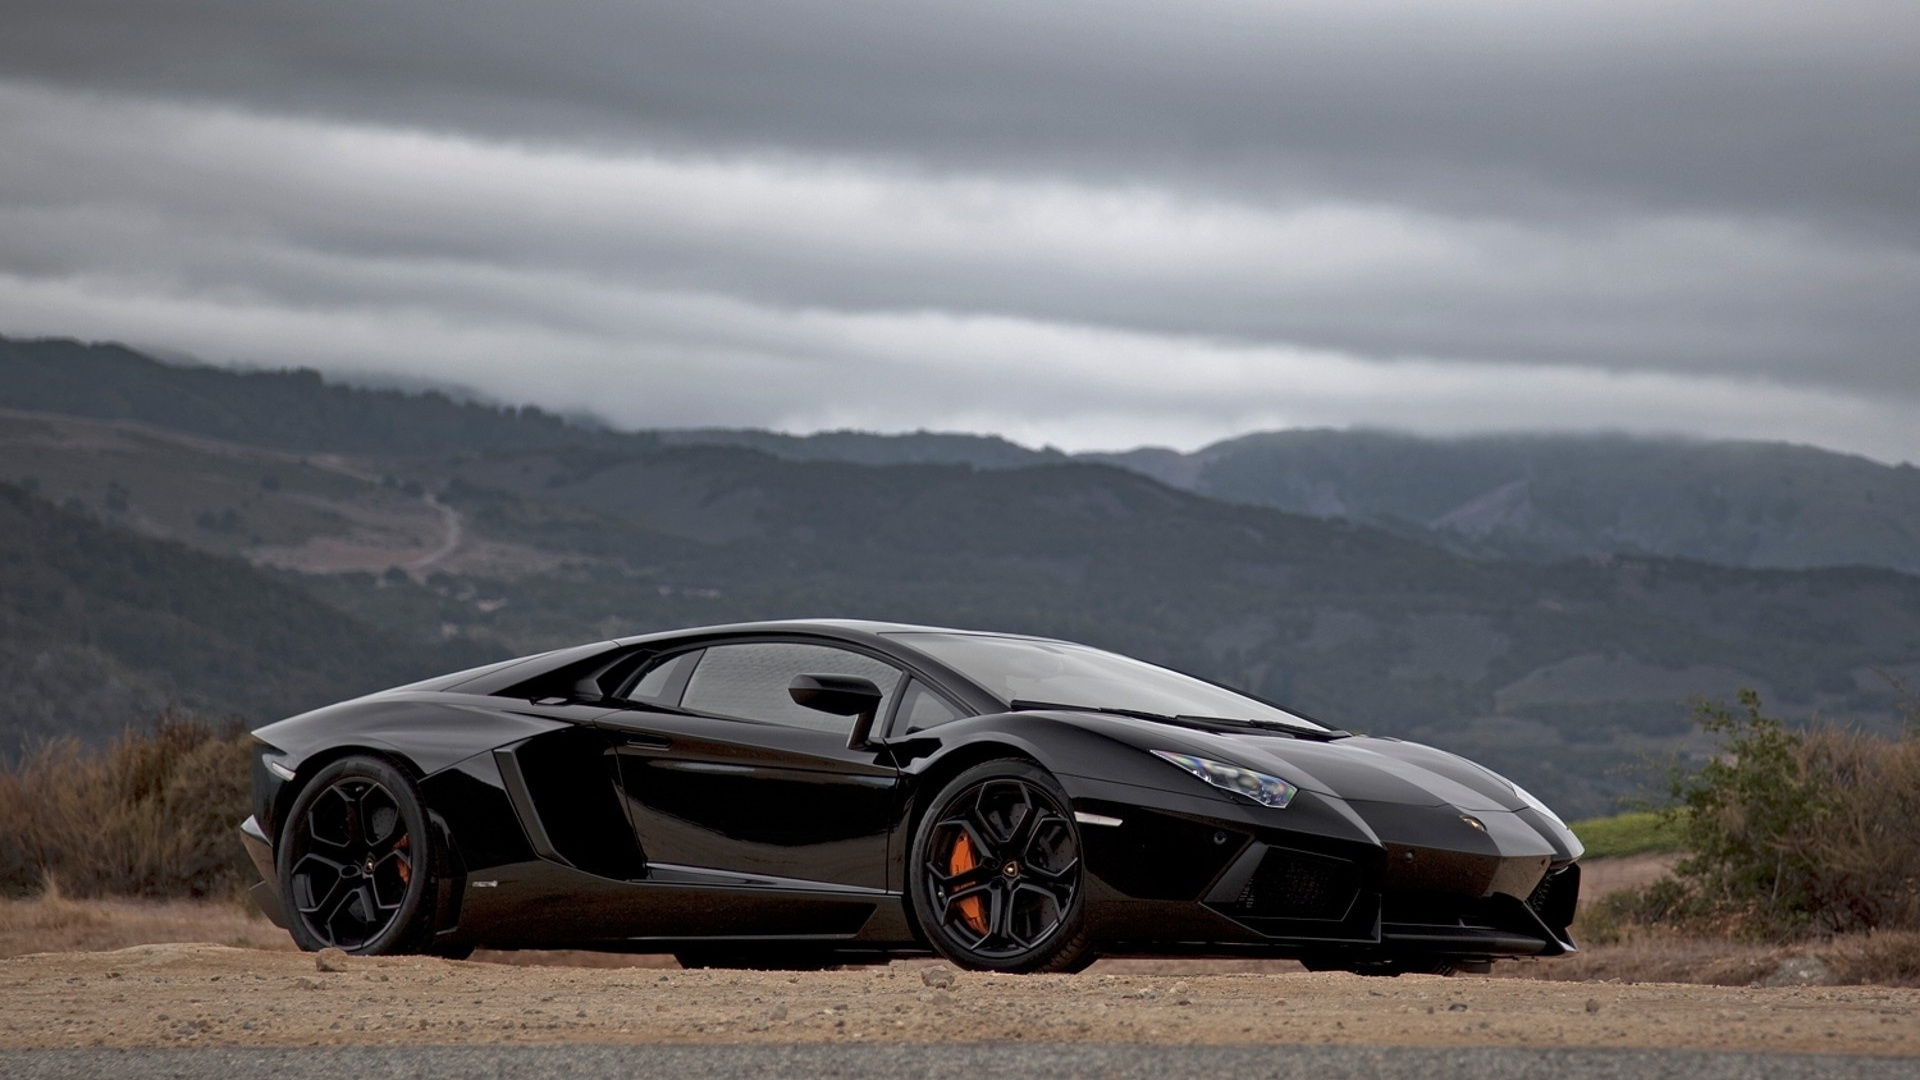 Lamborghini Aventador Wallpaper Formula 1 1920x1080